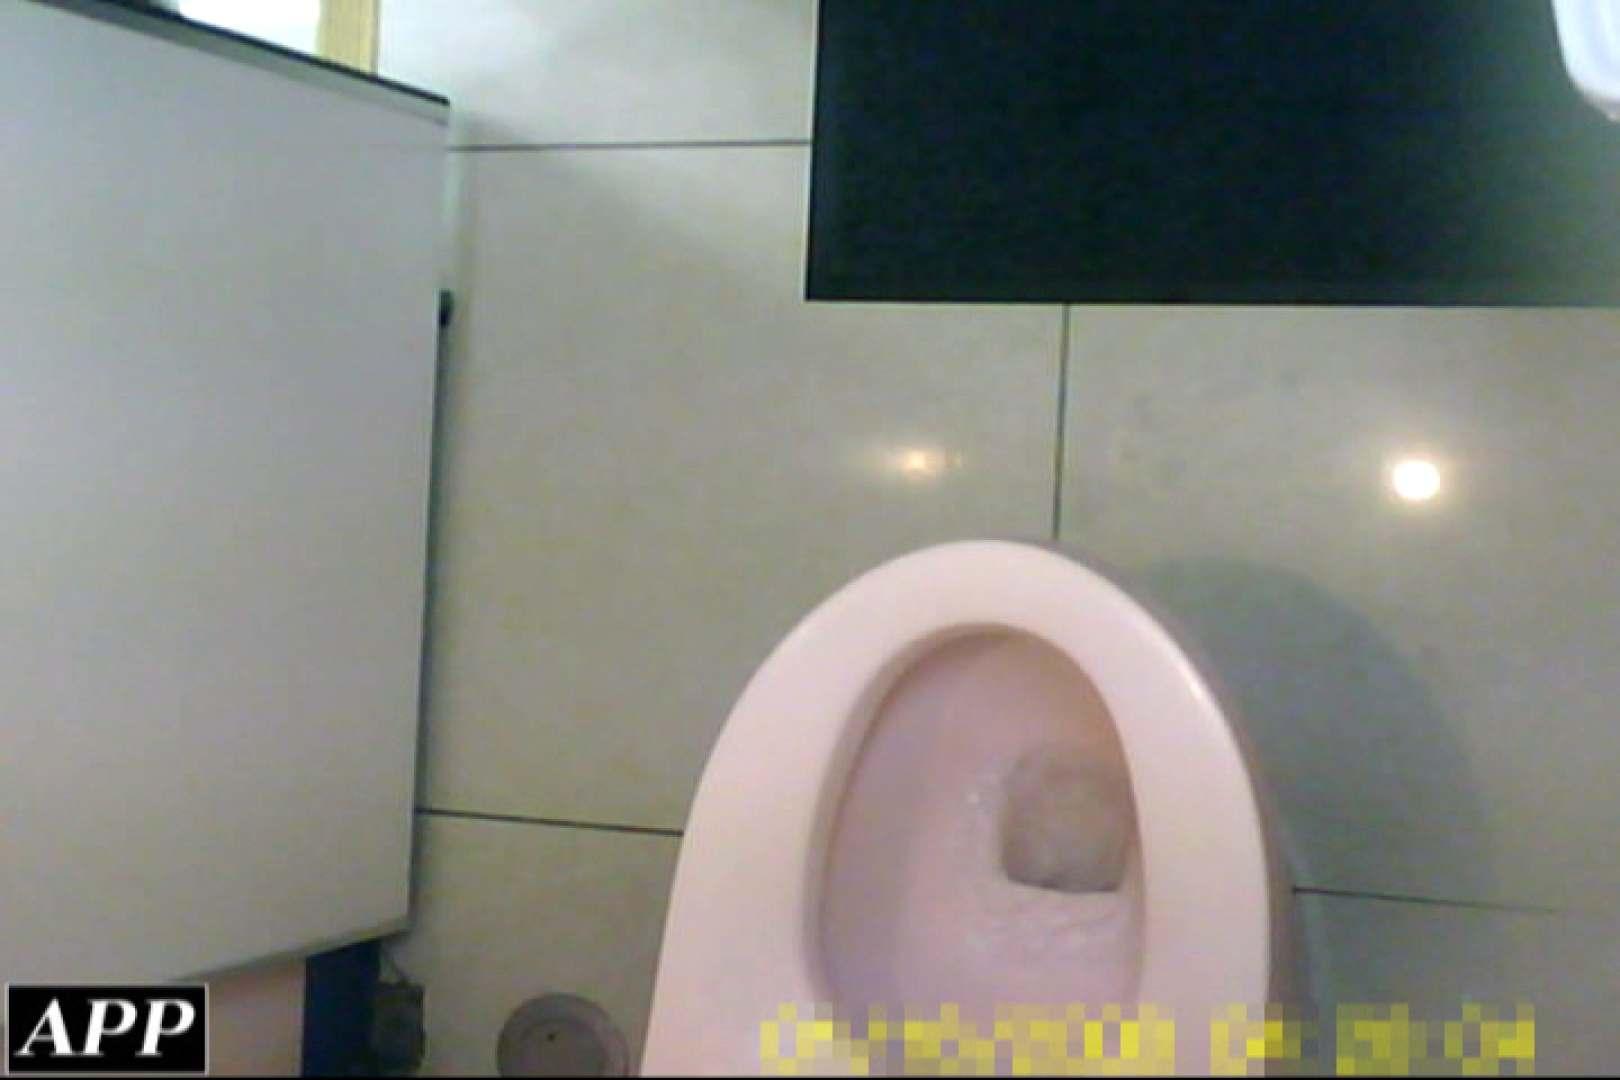 3視点洗面所 vol.79 OLハメ撮り  89Pix 80